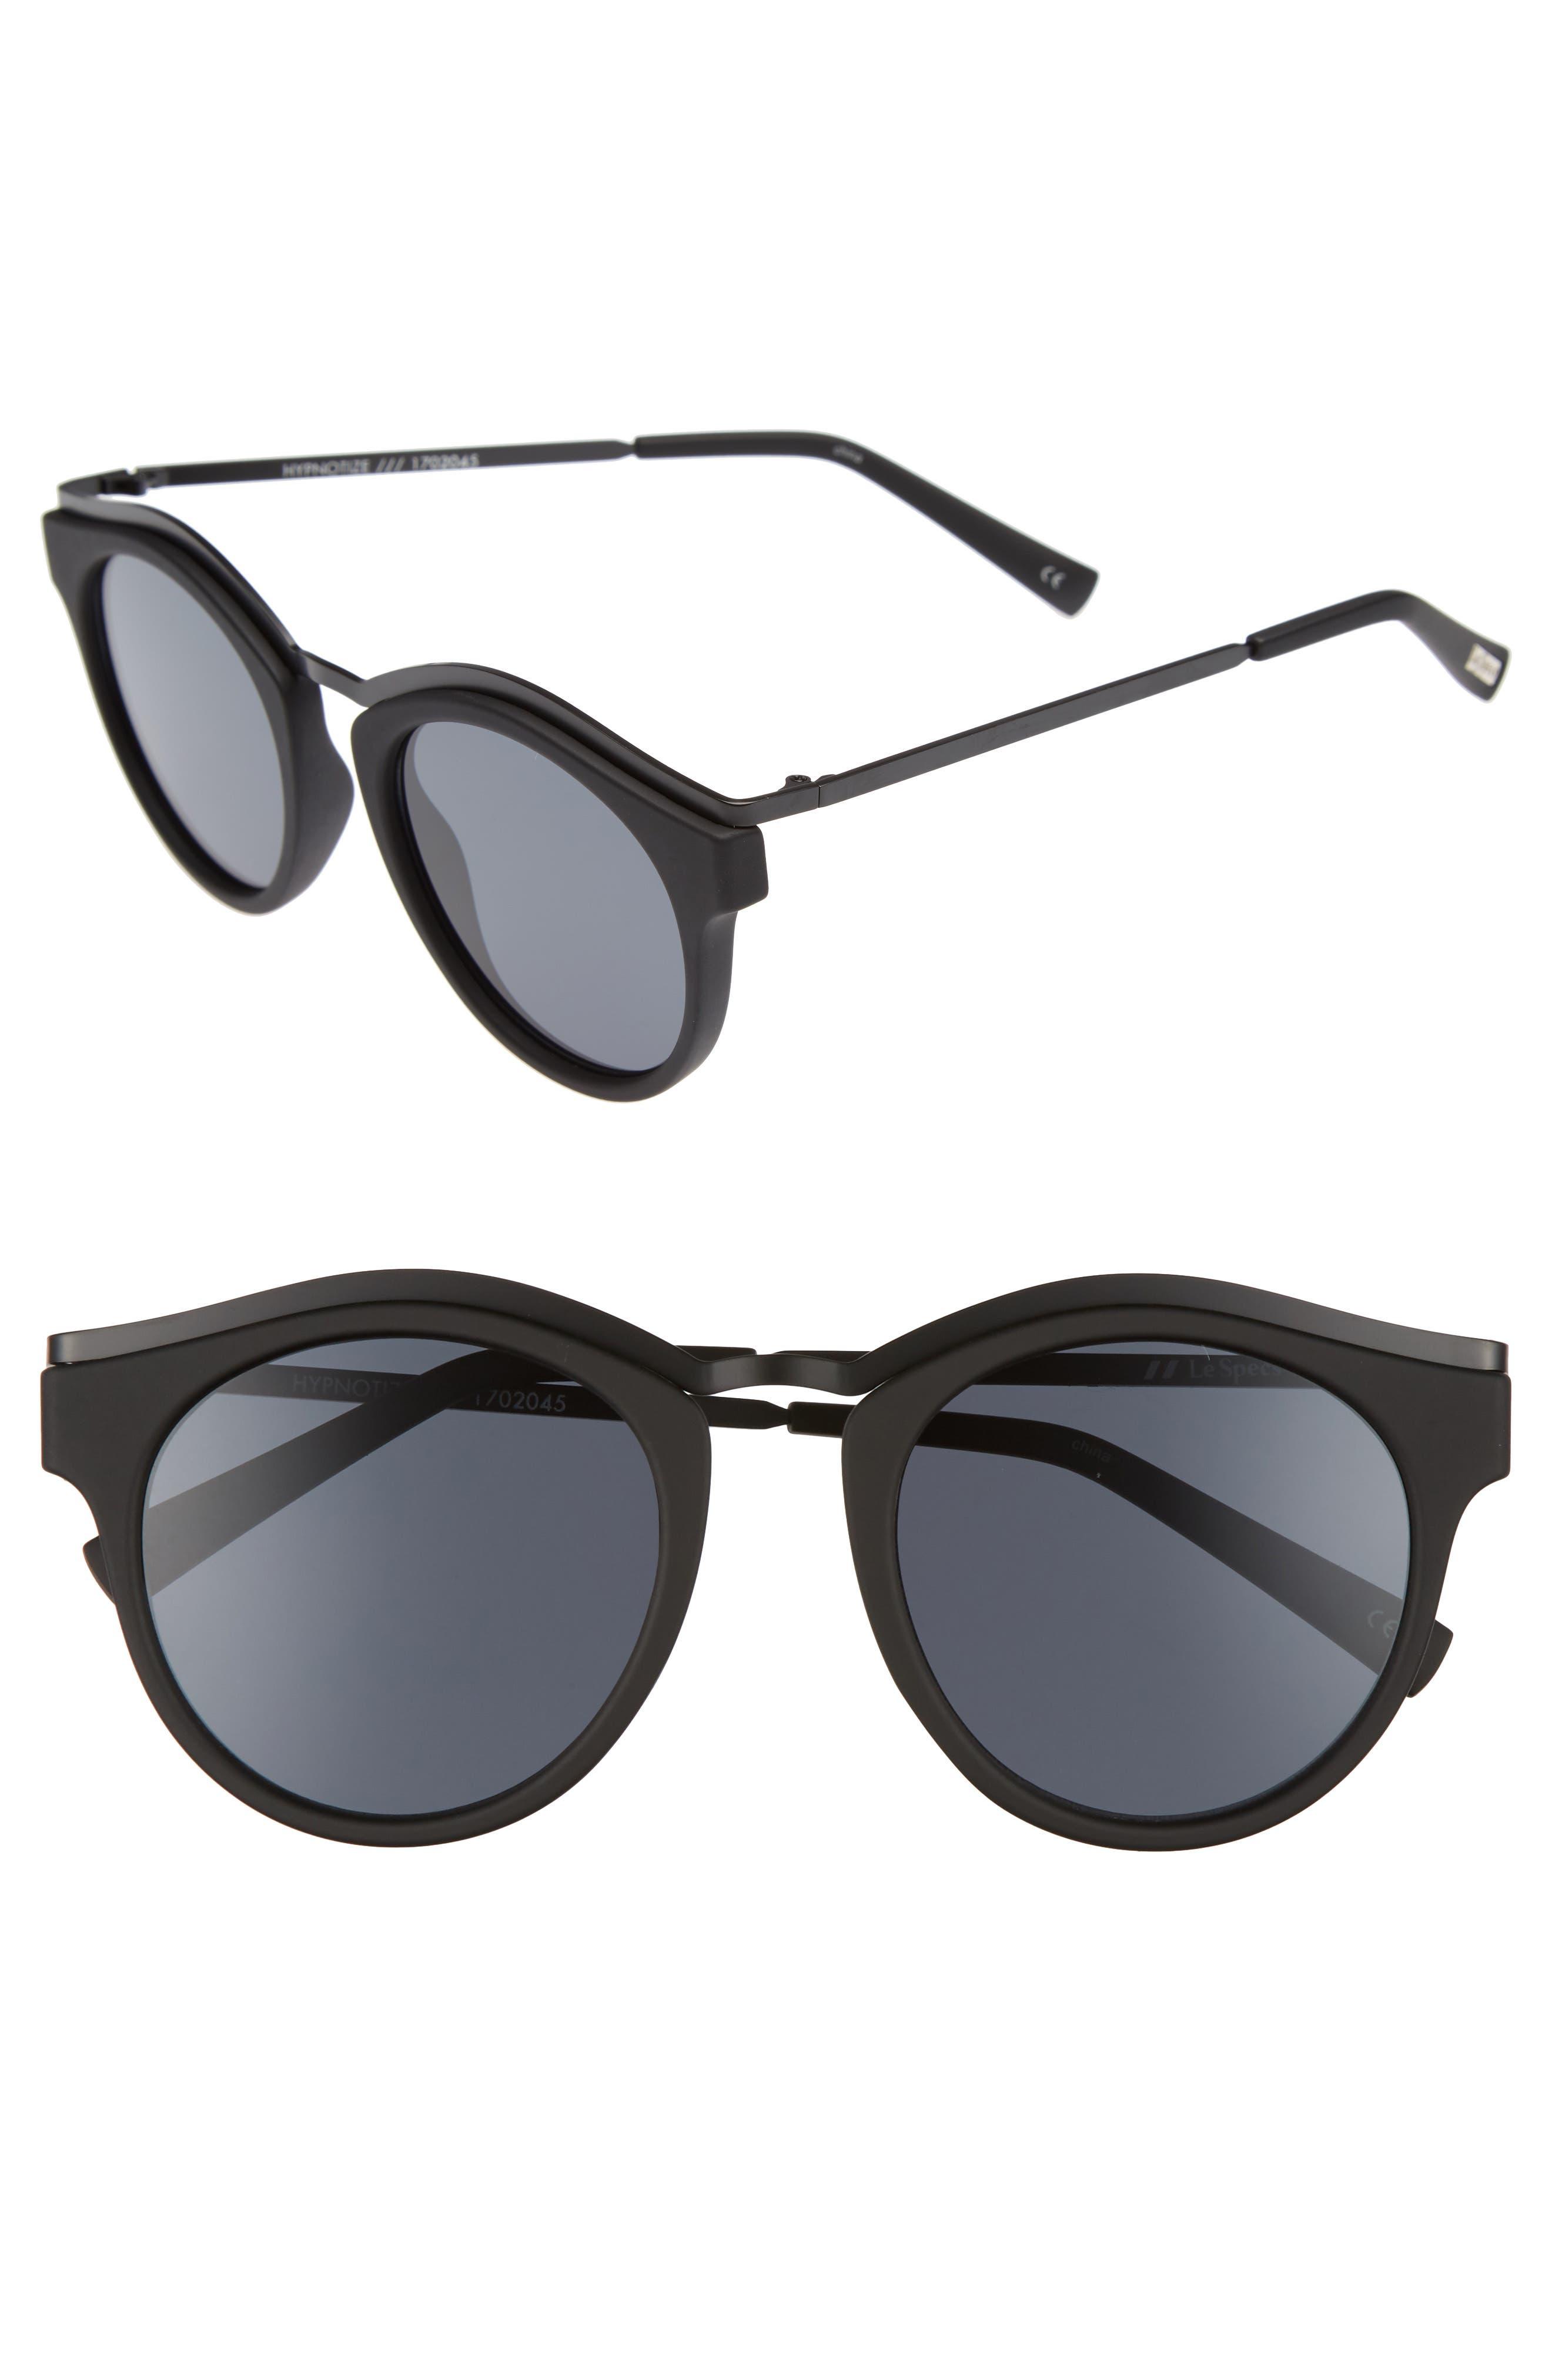 Main Image - Le Specs Hypnotize 50mm Round Sunglasses